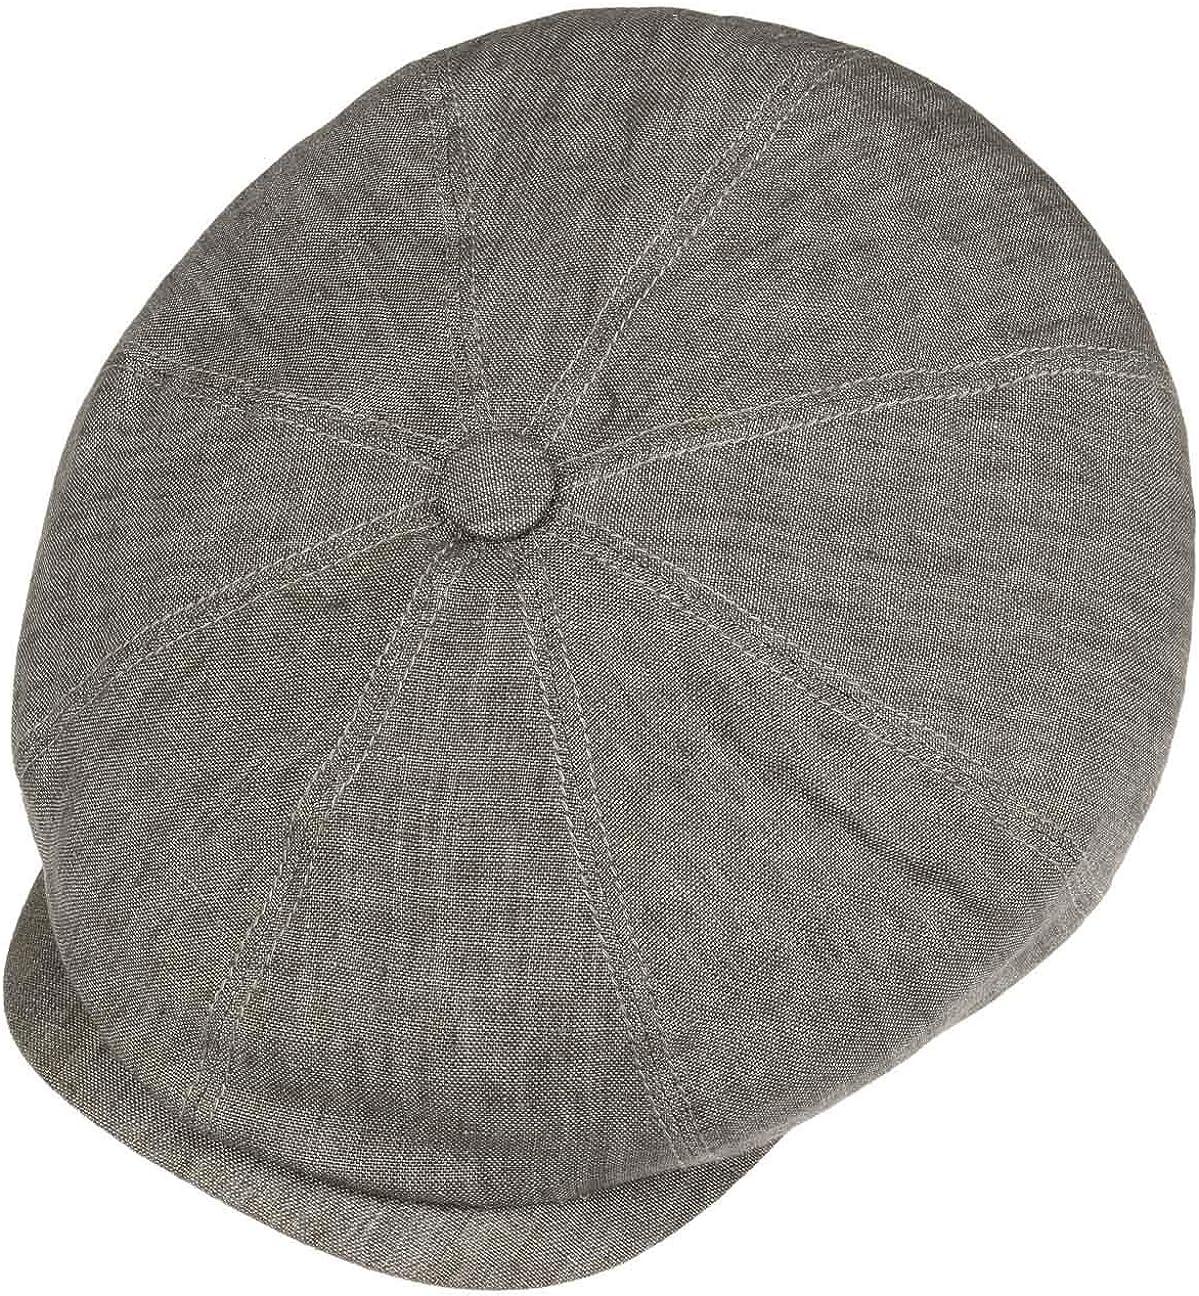 Spring//Summer Peaked Cap Cap with Cotton Lining Baker boy Cap Newsboy Cap with UV 40+ Sun Protection Stetson Hatteras Mens//Womens Linen Flat Cap